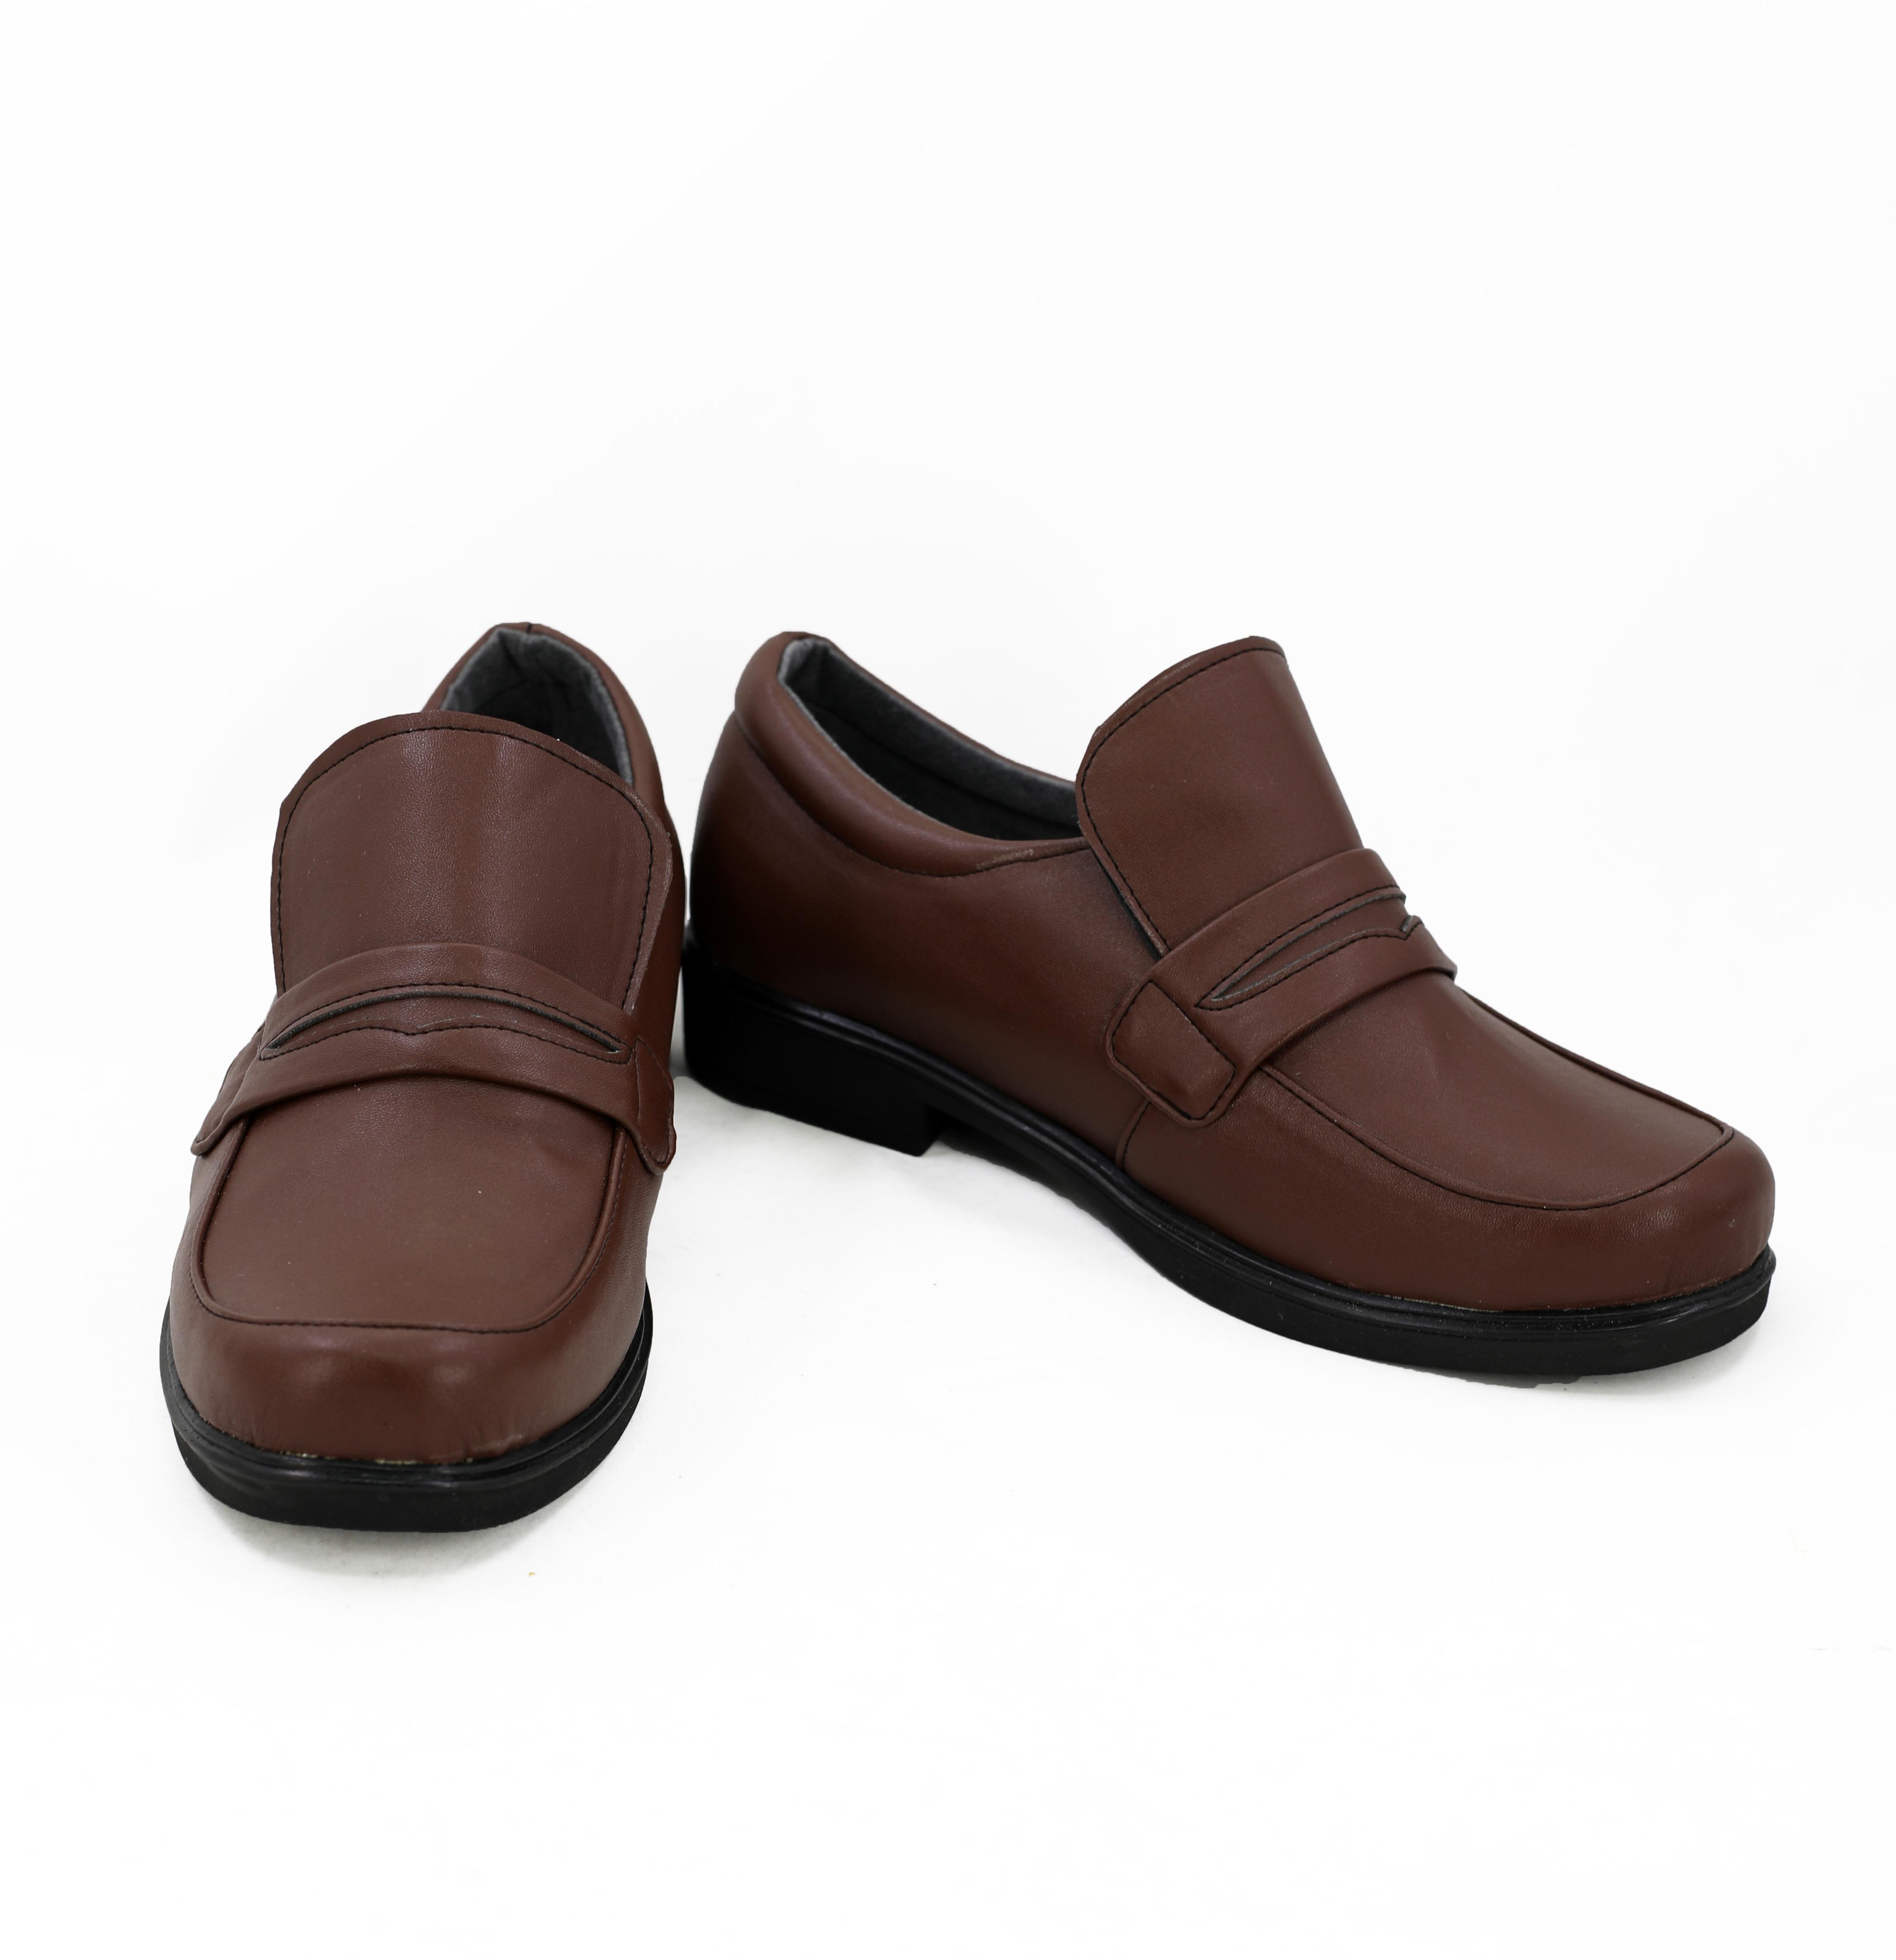 Mi héroe Academia Boku no héroe Academia Jirou Kyouka Cosplay zapatos OCHACO URARAKA Cosplay zapatos Asui Tsuyu Cosplay zapatos de estudiante zapatos